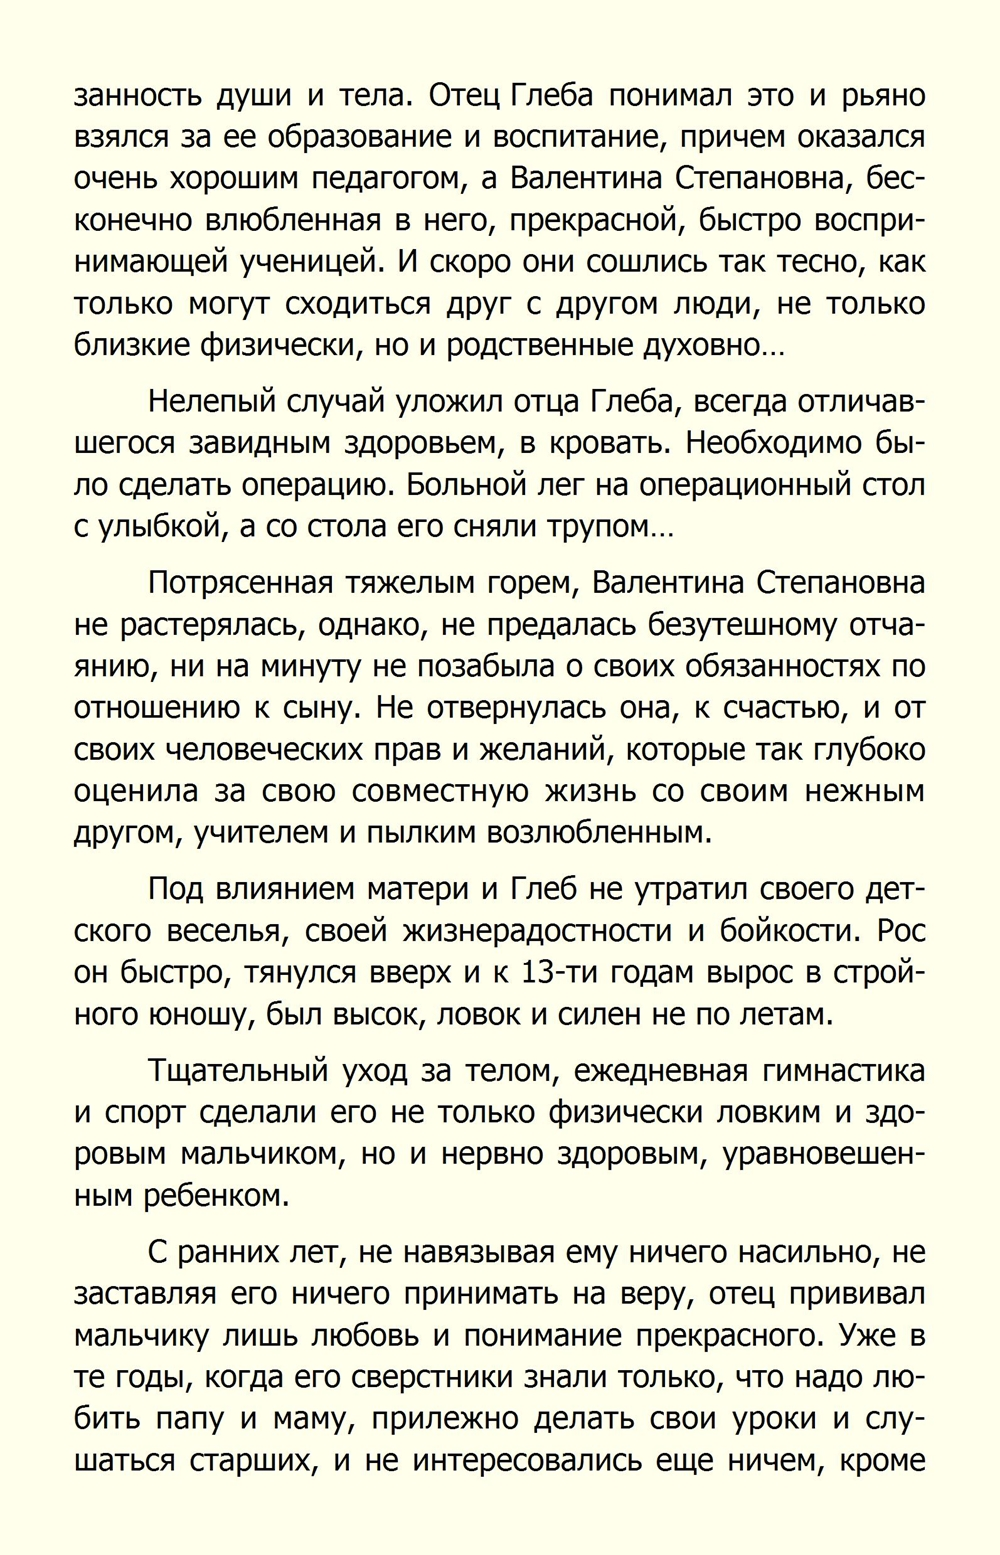 http://ipic.su/img/img7/fs/Morskoj.1584704303.jpg